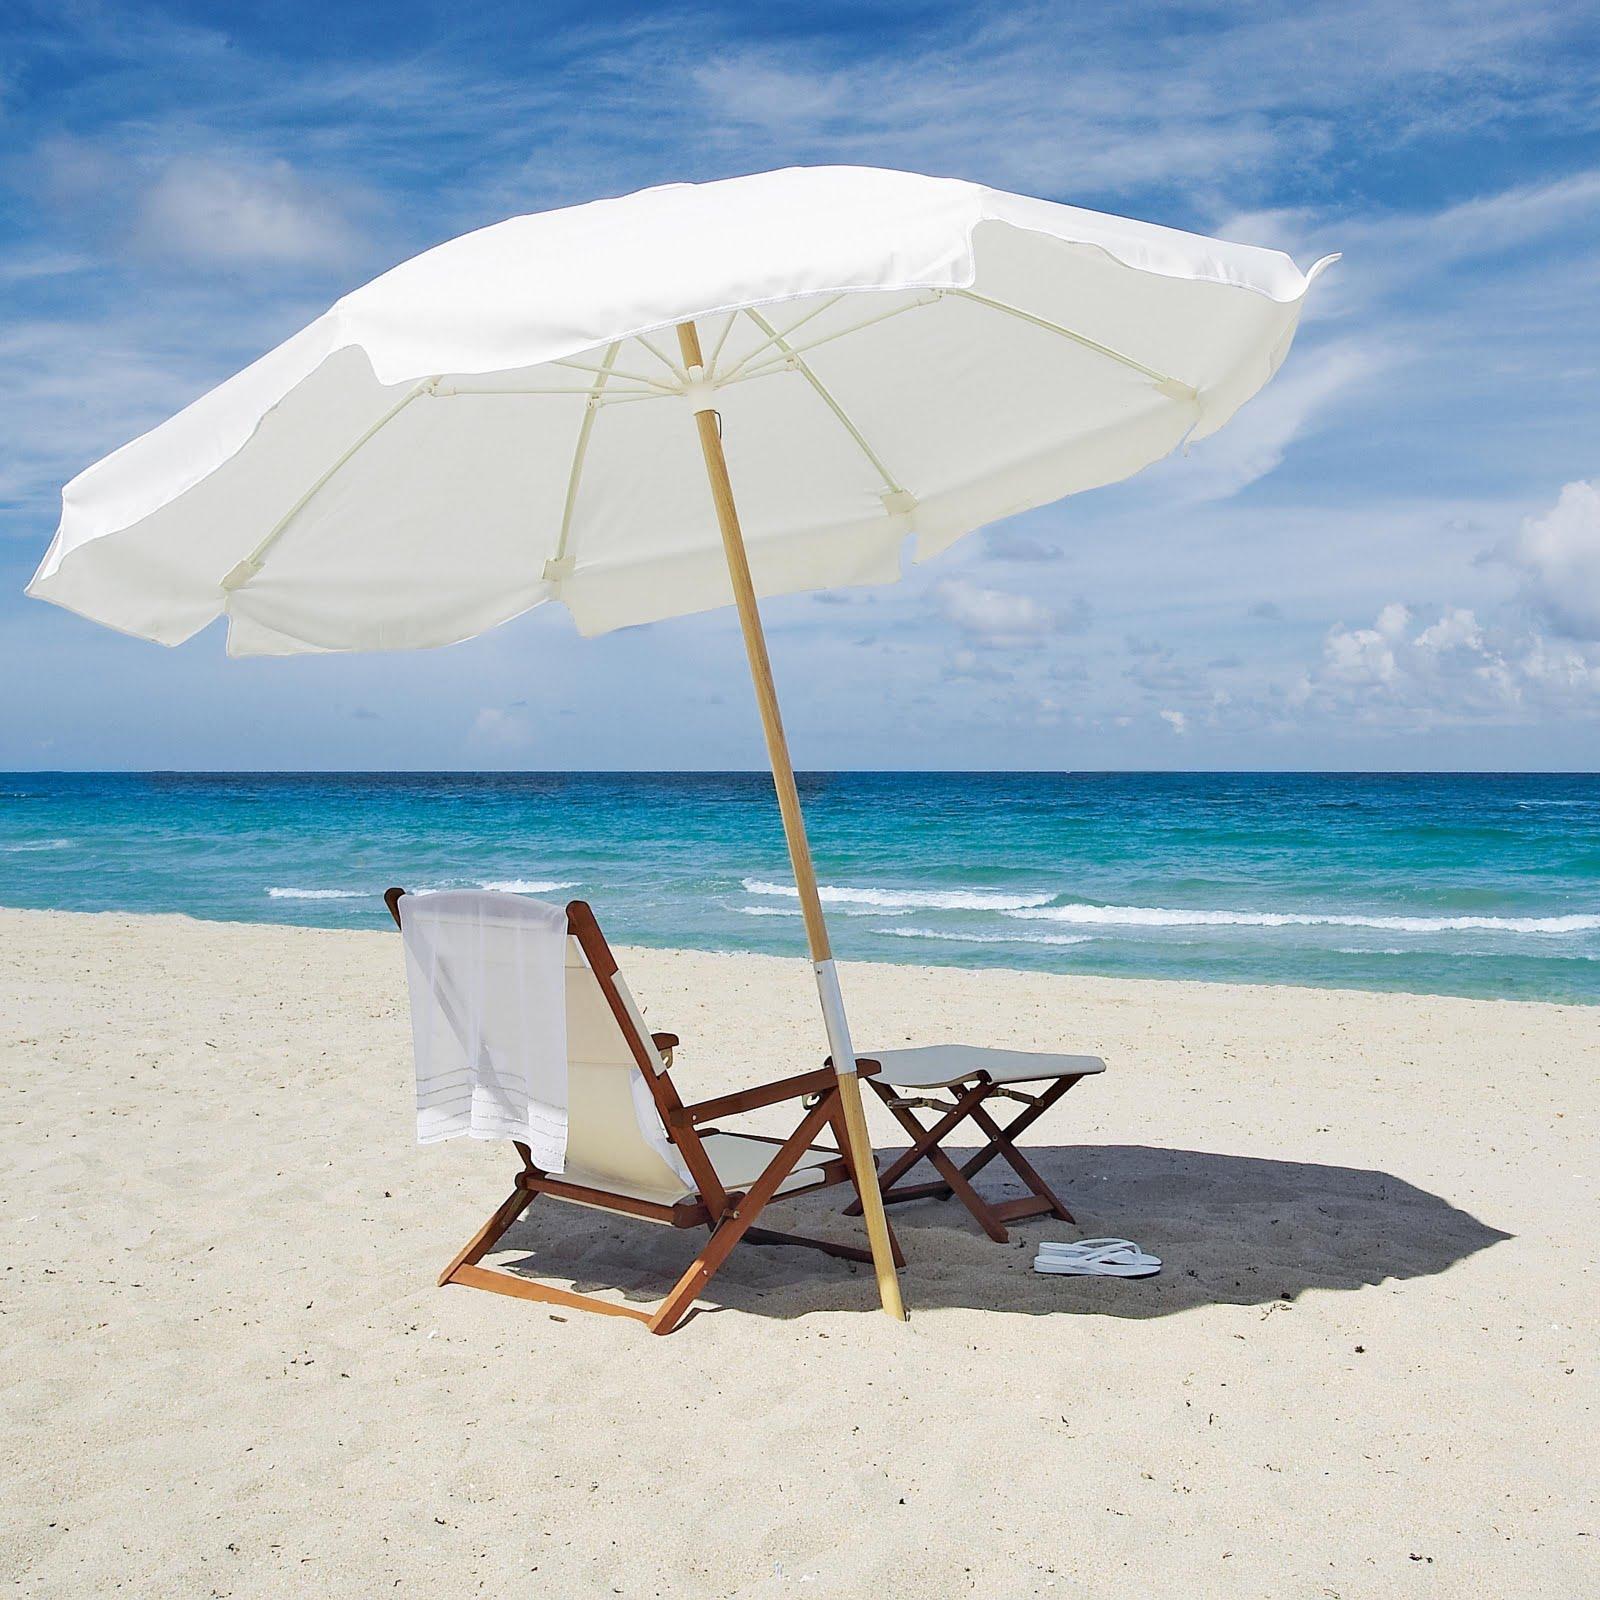 Marriott Vacation Club to Open in Australia